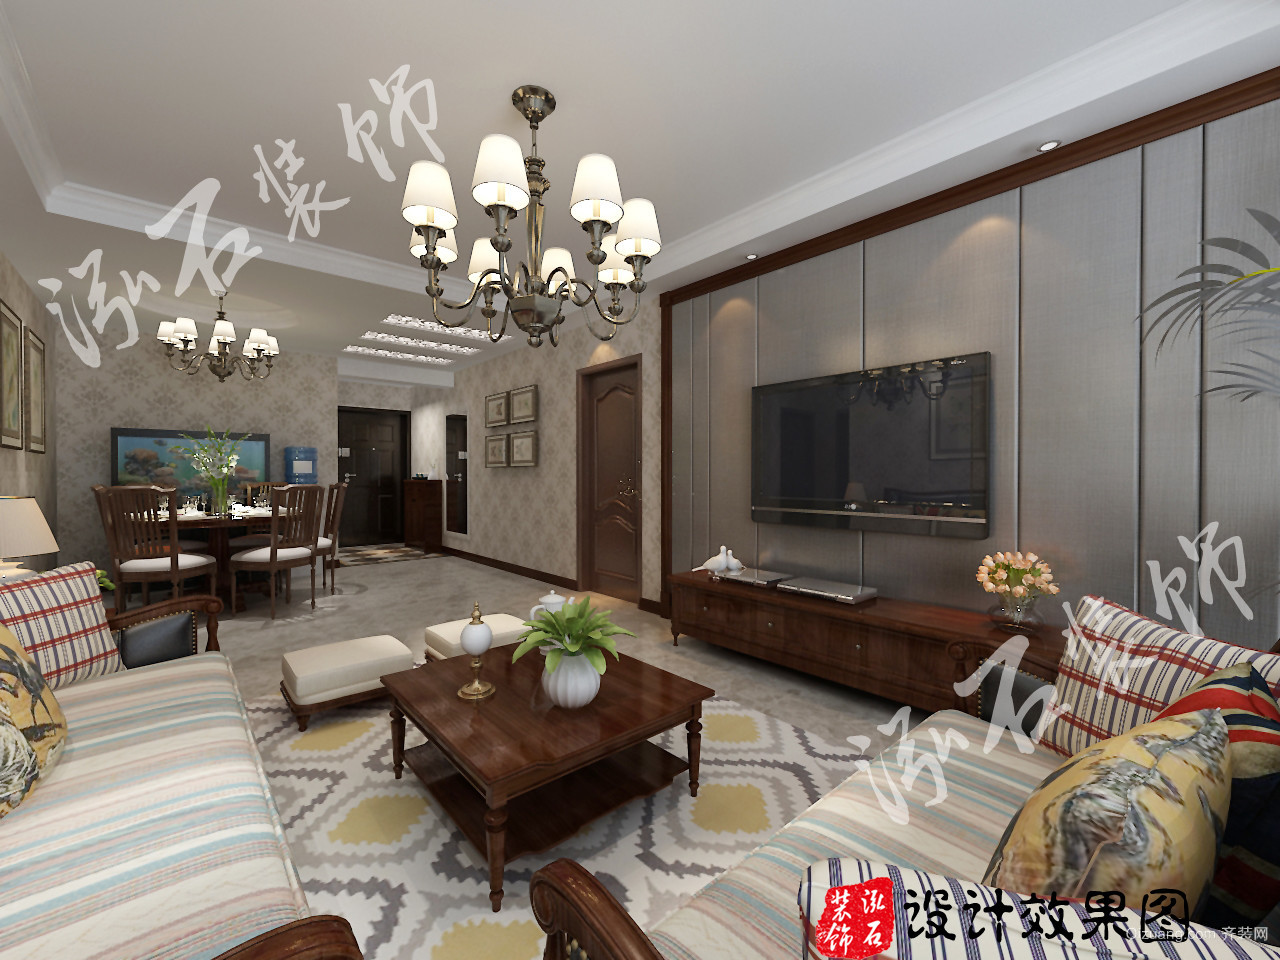 K2·京南狮子城美式风格装修效果图实景图